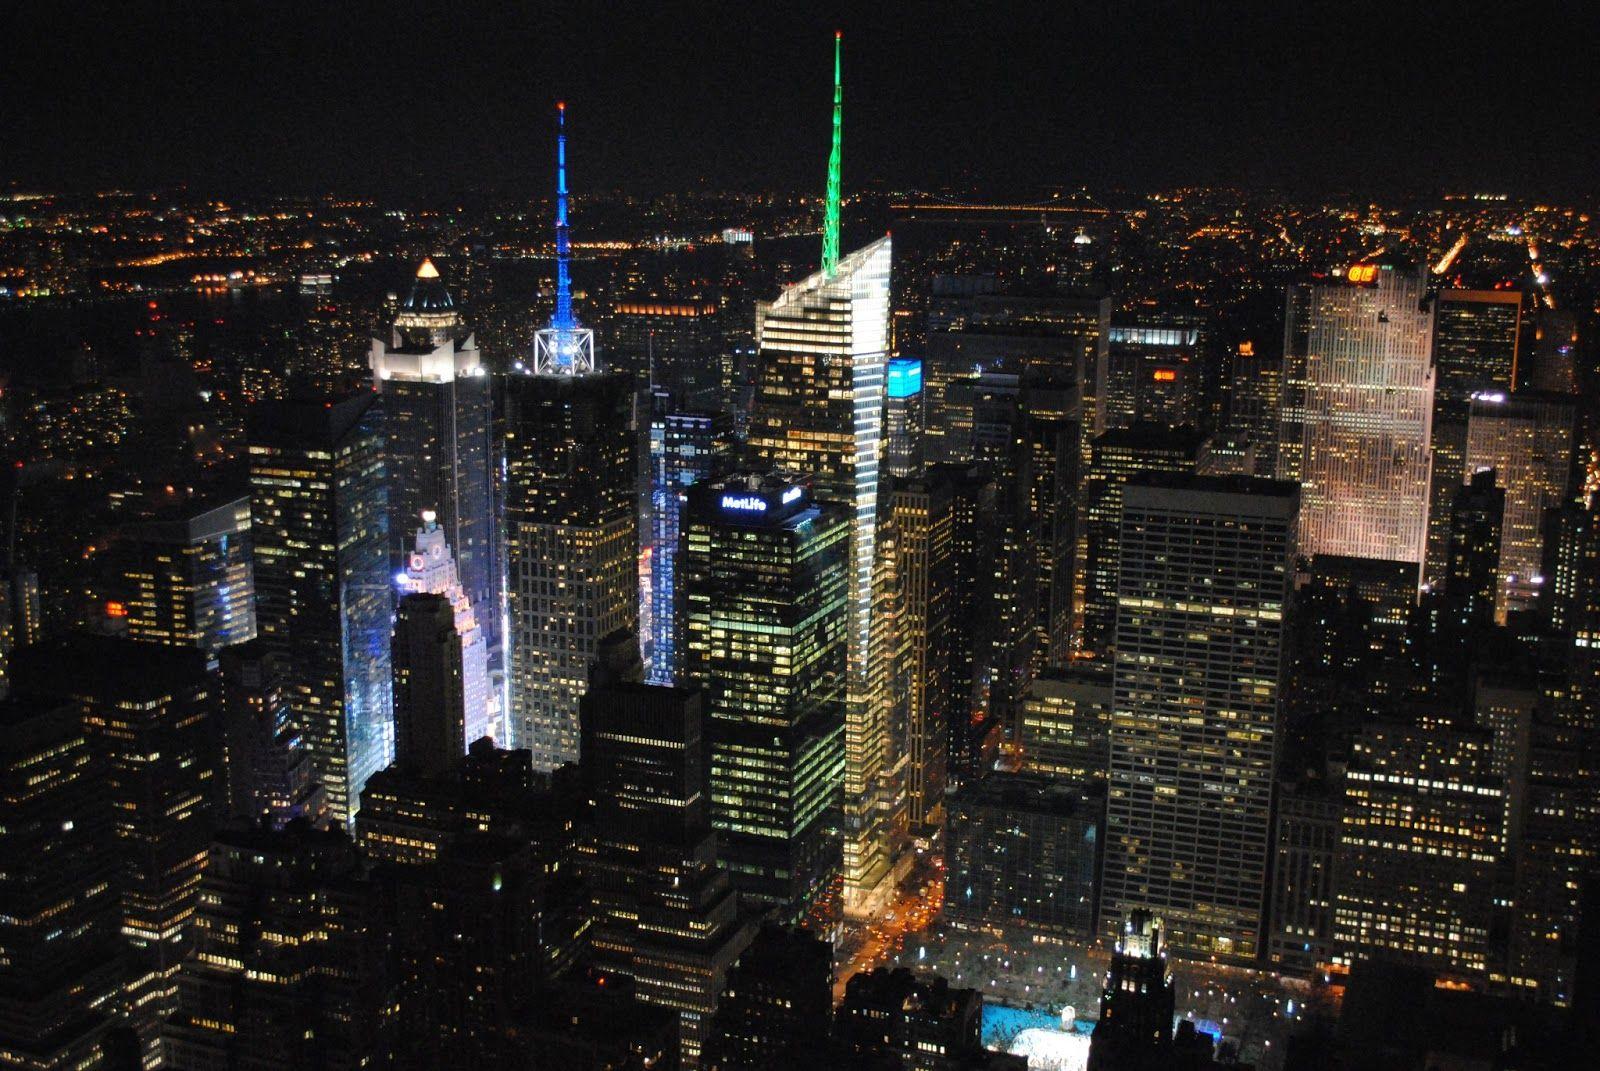 City Hd Desktop Wallpaper 1080p Free Download Fine Hd Wallpapers New York Skyline Empire State Building Nyc Skyline